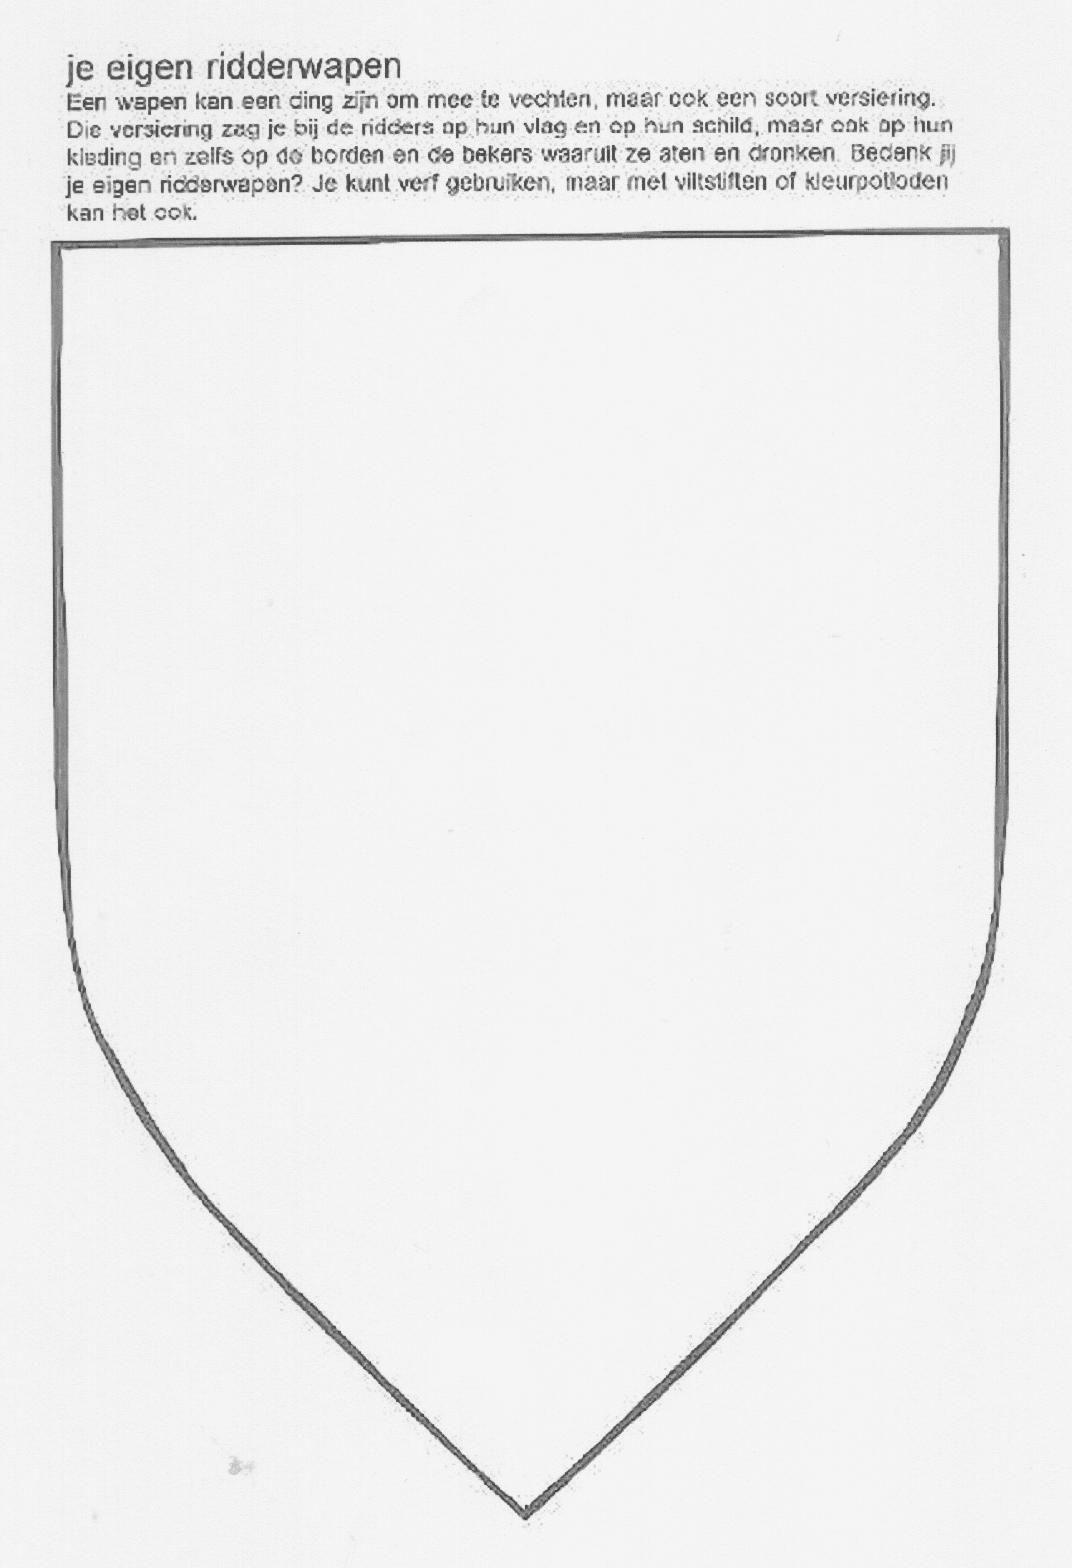 Ridders En Kastelen Ridders Kastelen Middeleeuwse Ridder